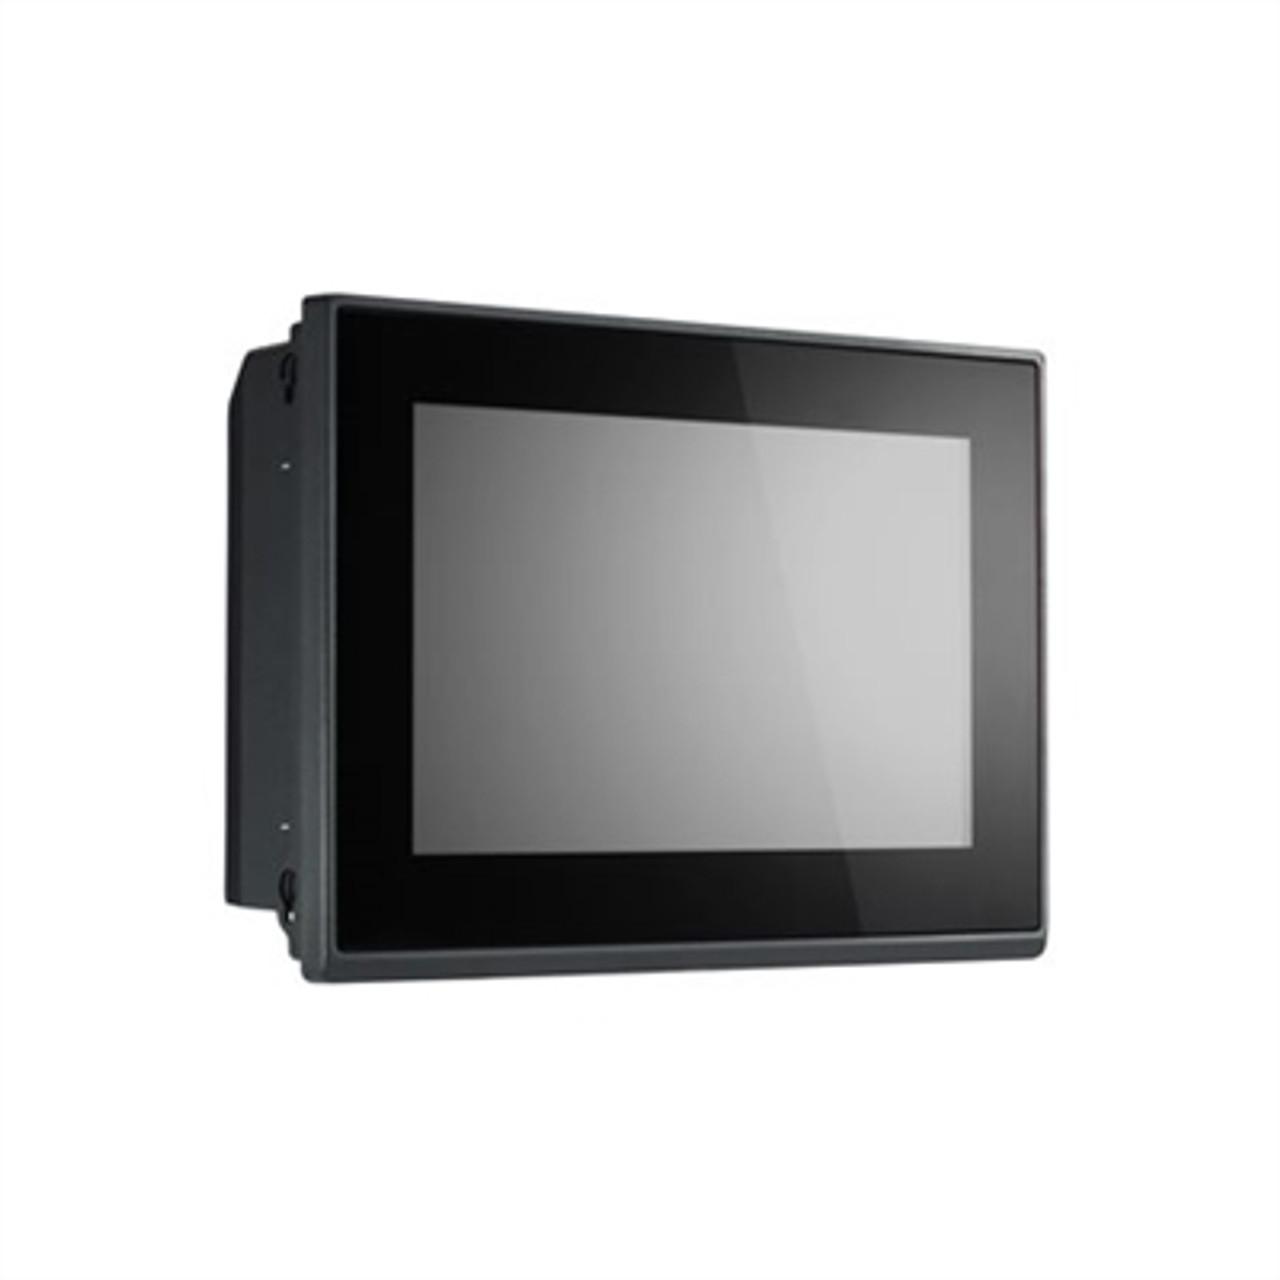 Moxa MPC-2070-E2-LB-T 7 inch industrial panel computer